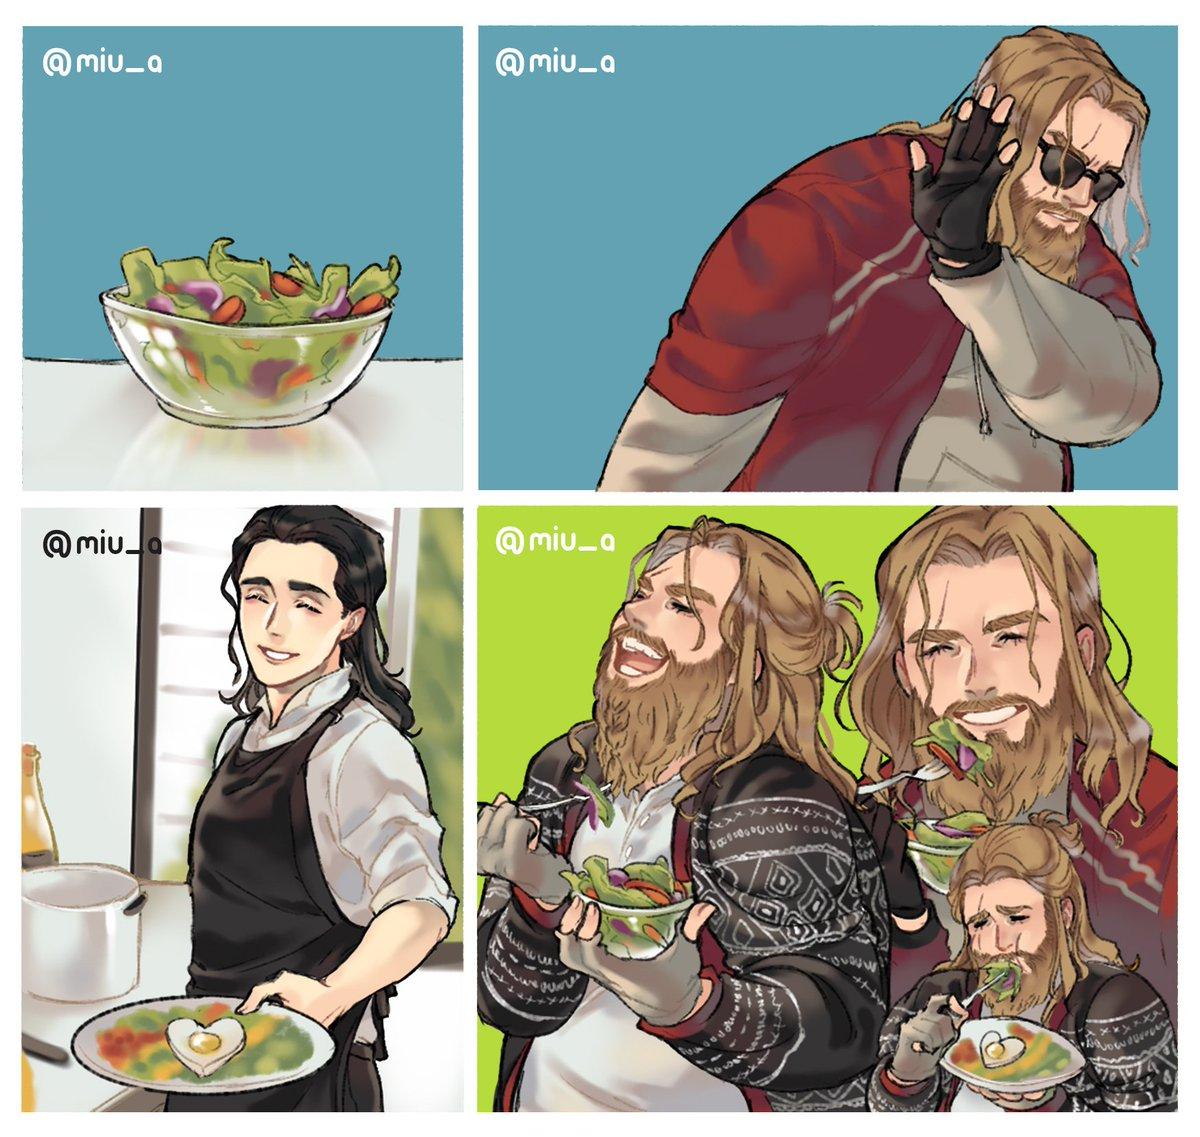 How to make thor eats his salad   #AvengersEndgame  <br>http://pic.twitter.com/TfhaW3QHC3